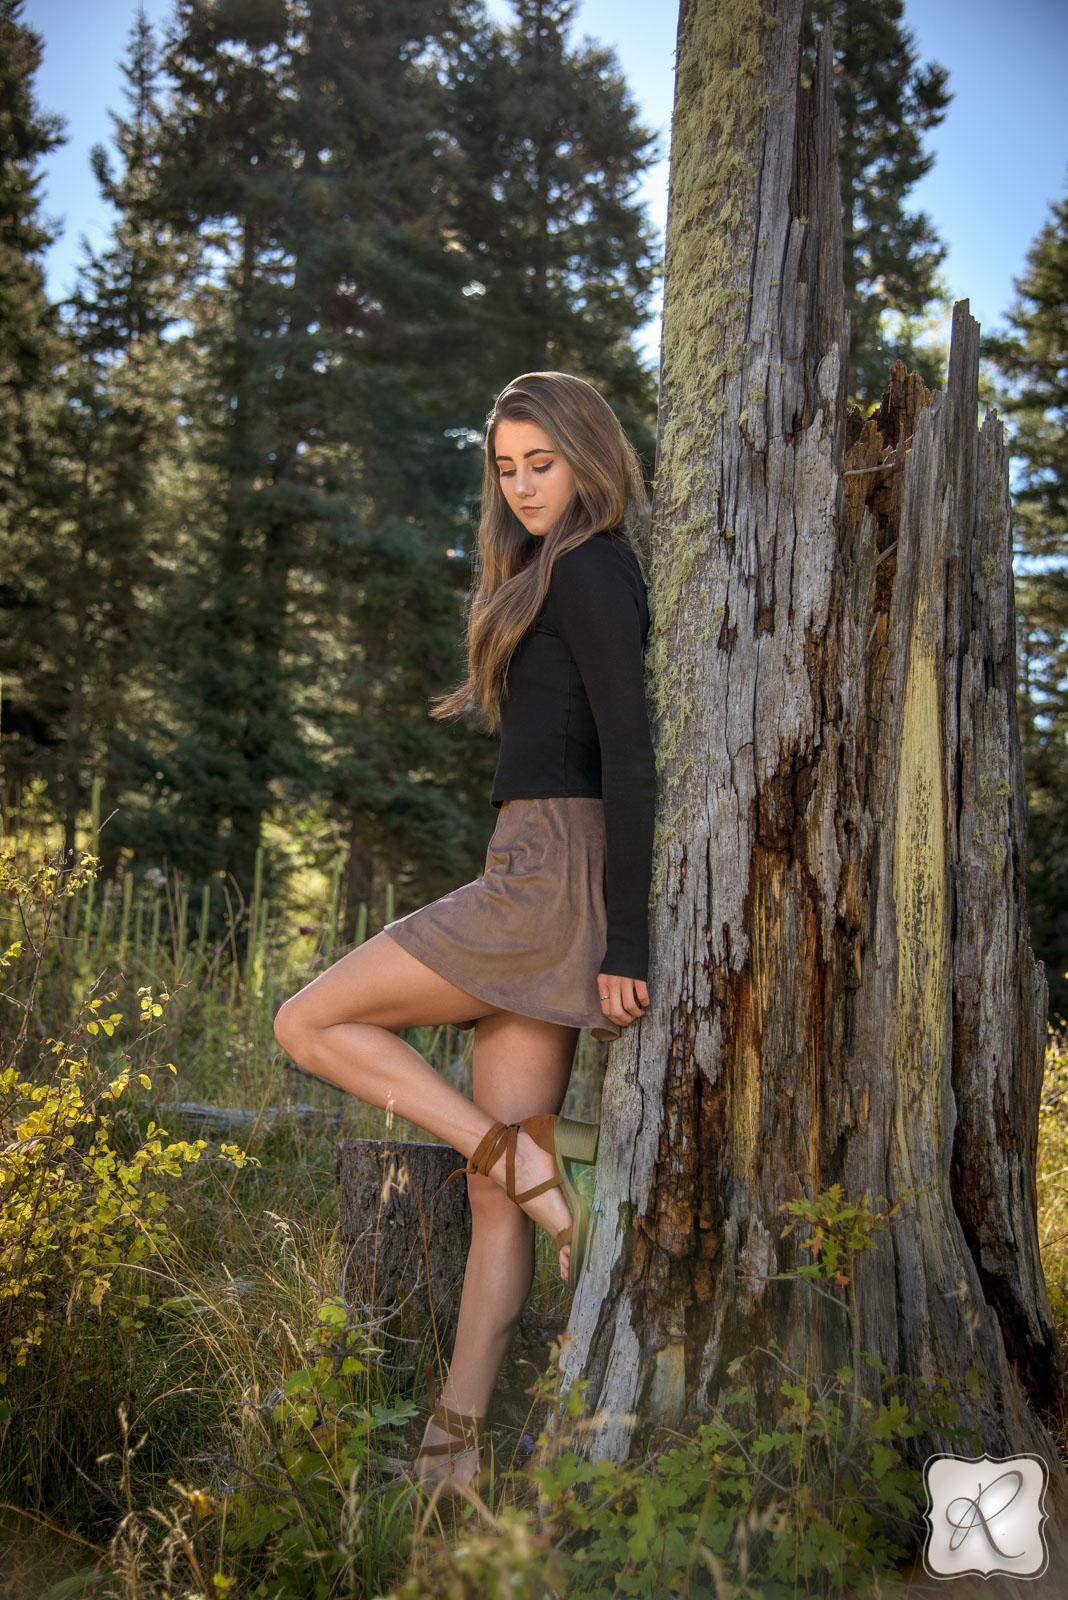 professional senior portraits in Durango, Colorado